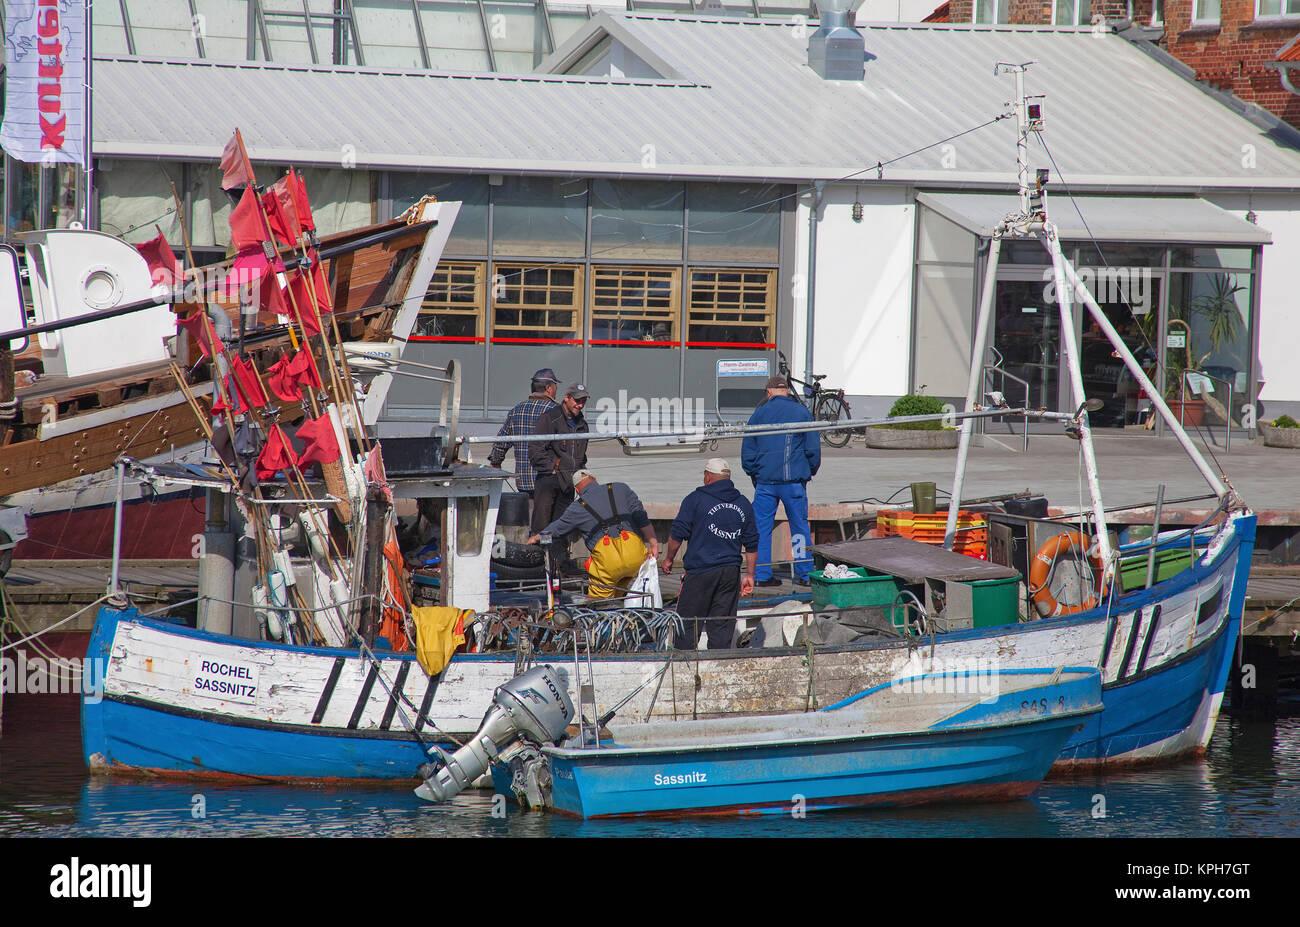 Fishermen at the harbour of Sassnitz, Ruegen island, Mecklenburg-Western Pomerania, Baltic Sea, Germany, Europe Stock Photo